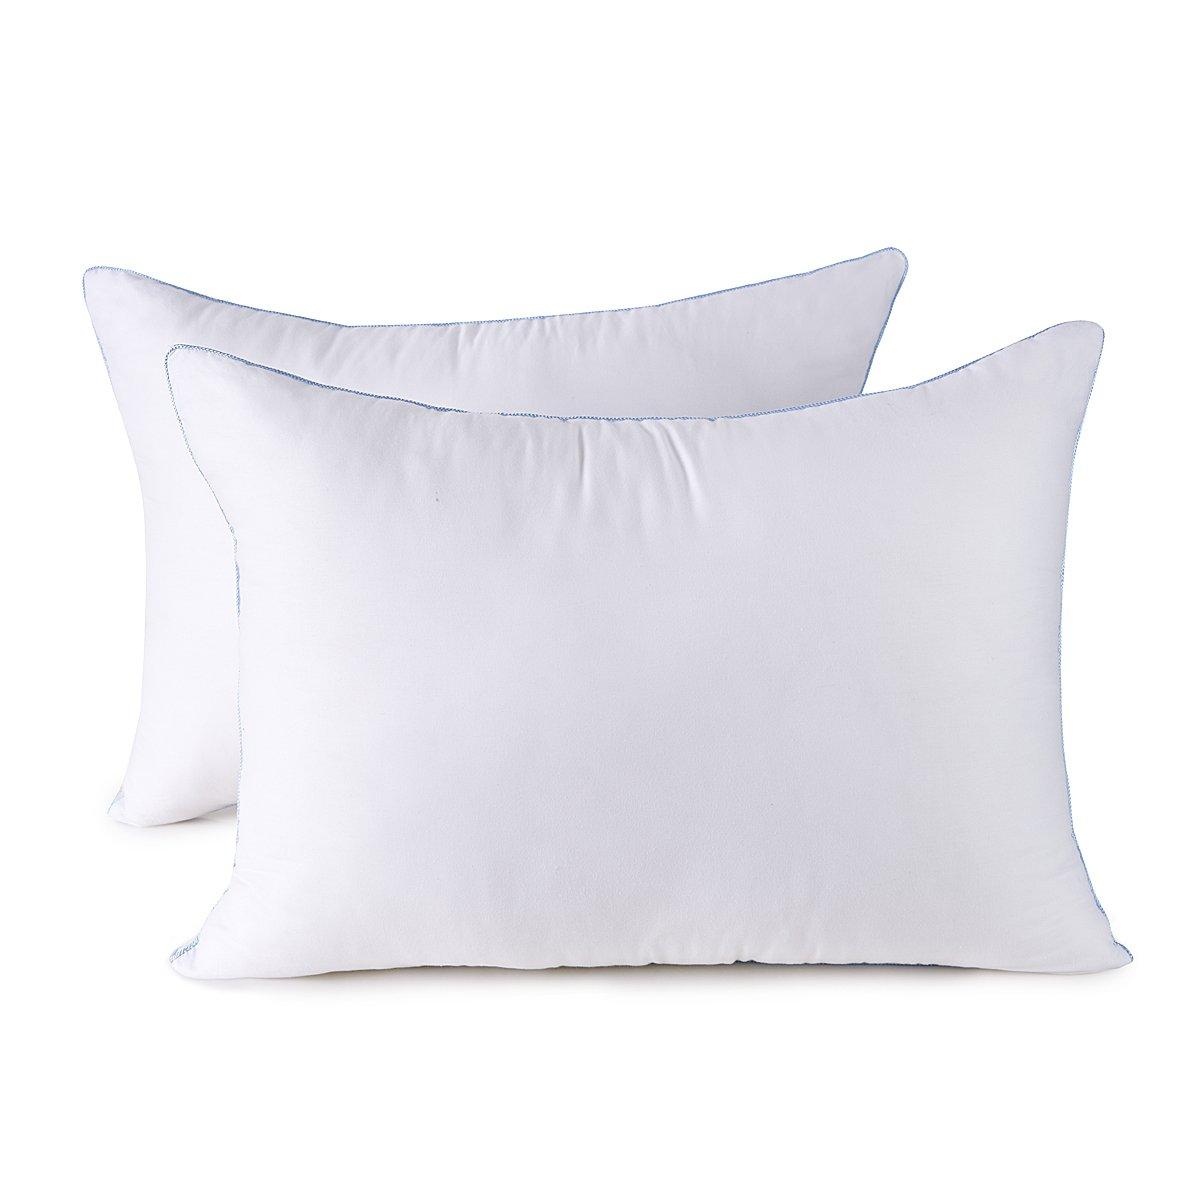 HOMESJUN Set of Two, Fluffy Down Alternative Bed Pillow Hypo-Allergenic 100% Cotton, White, 20x28